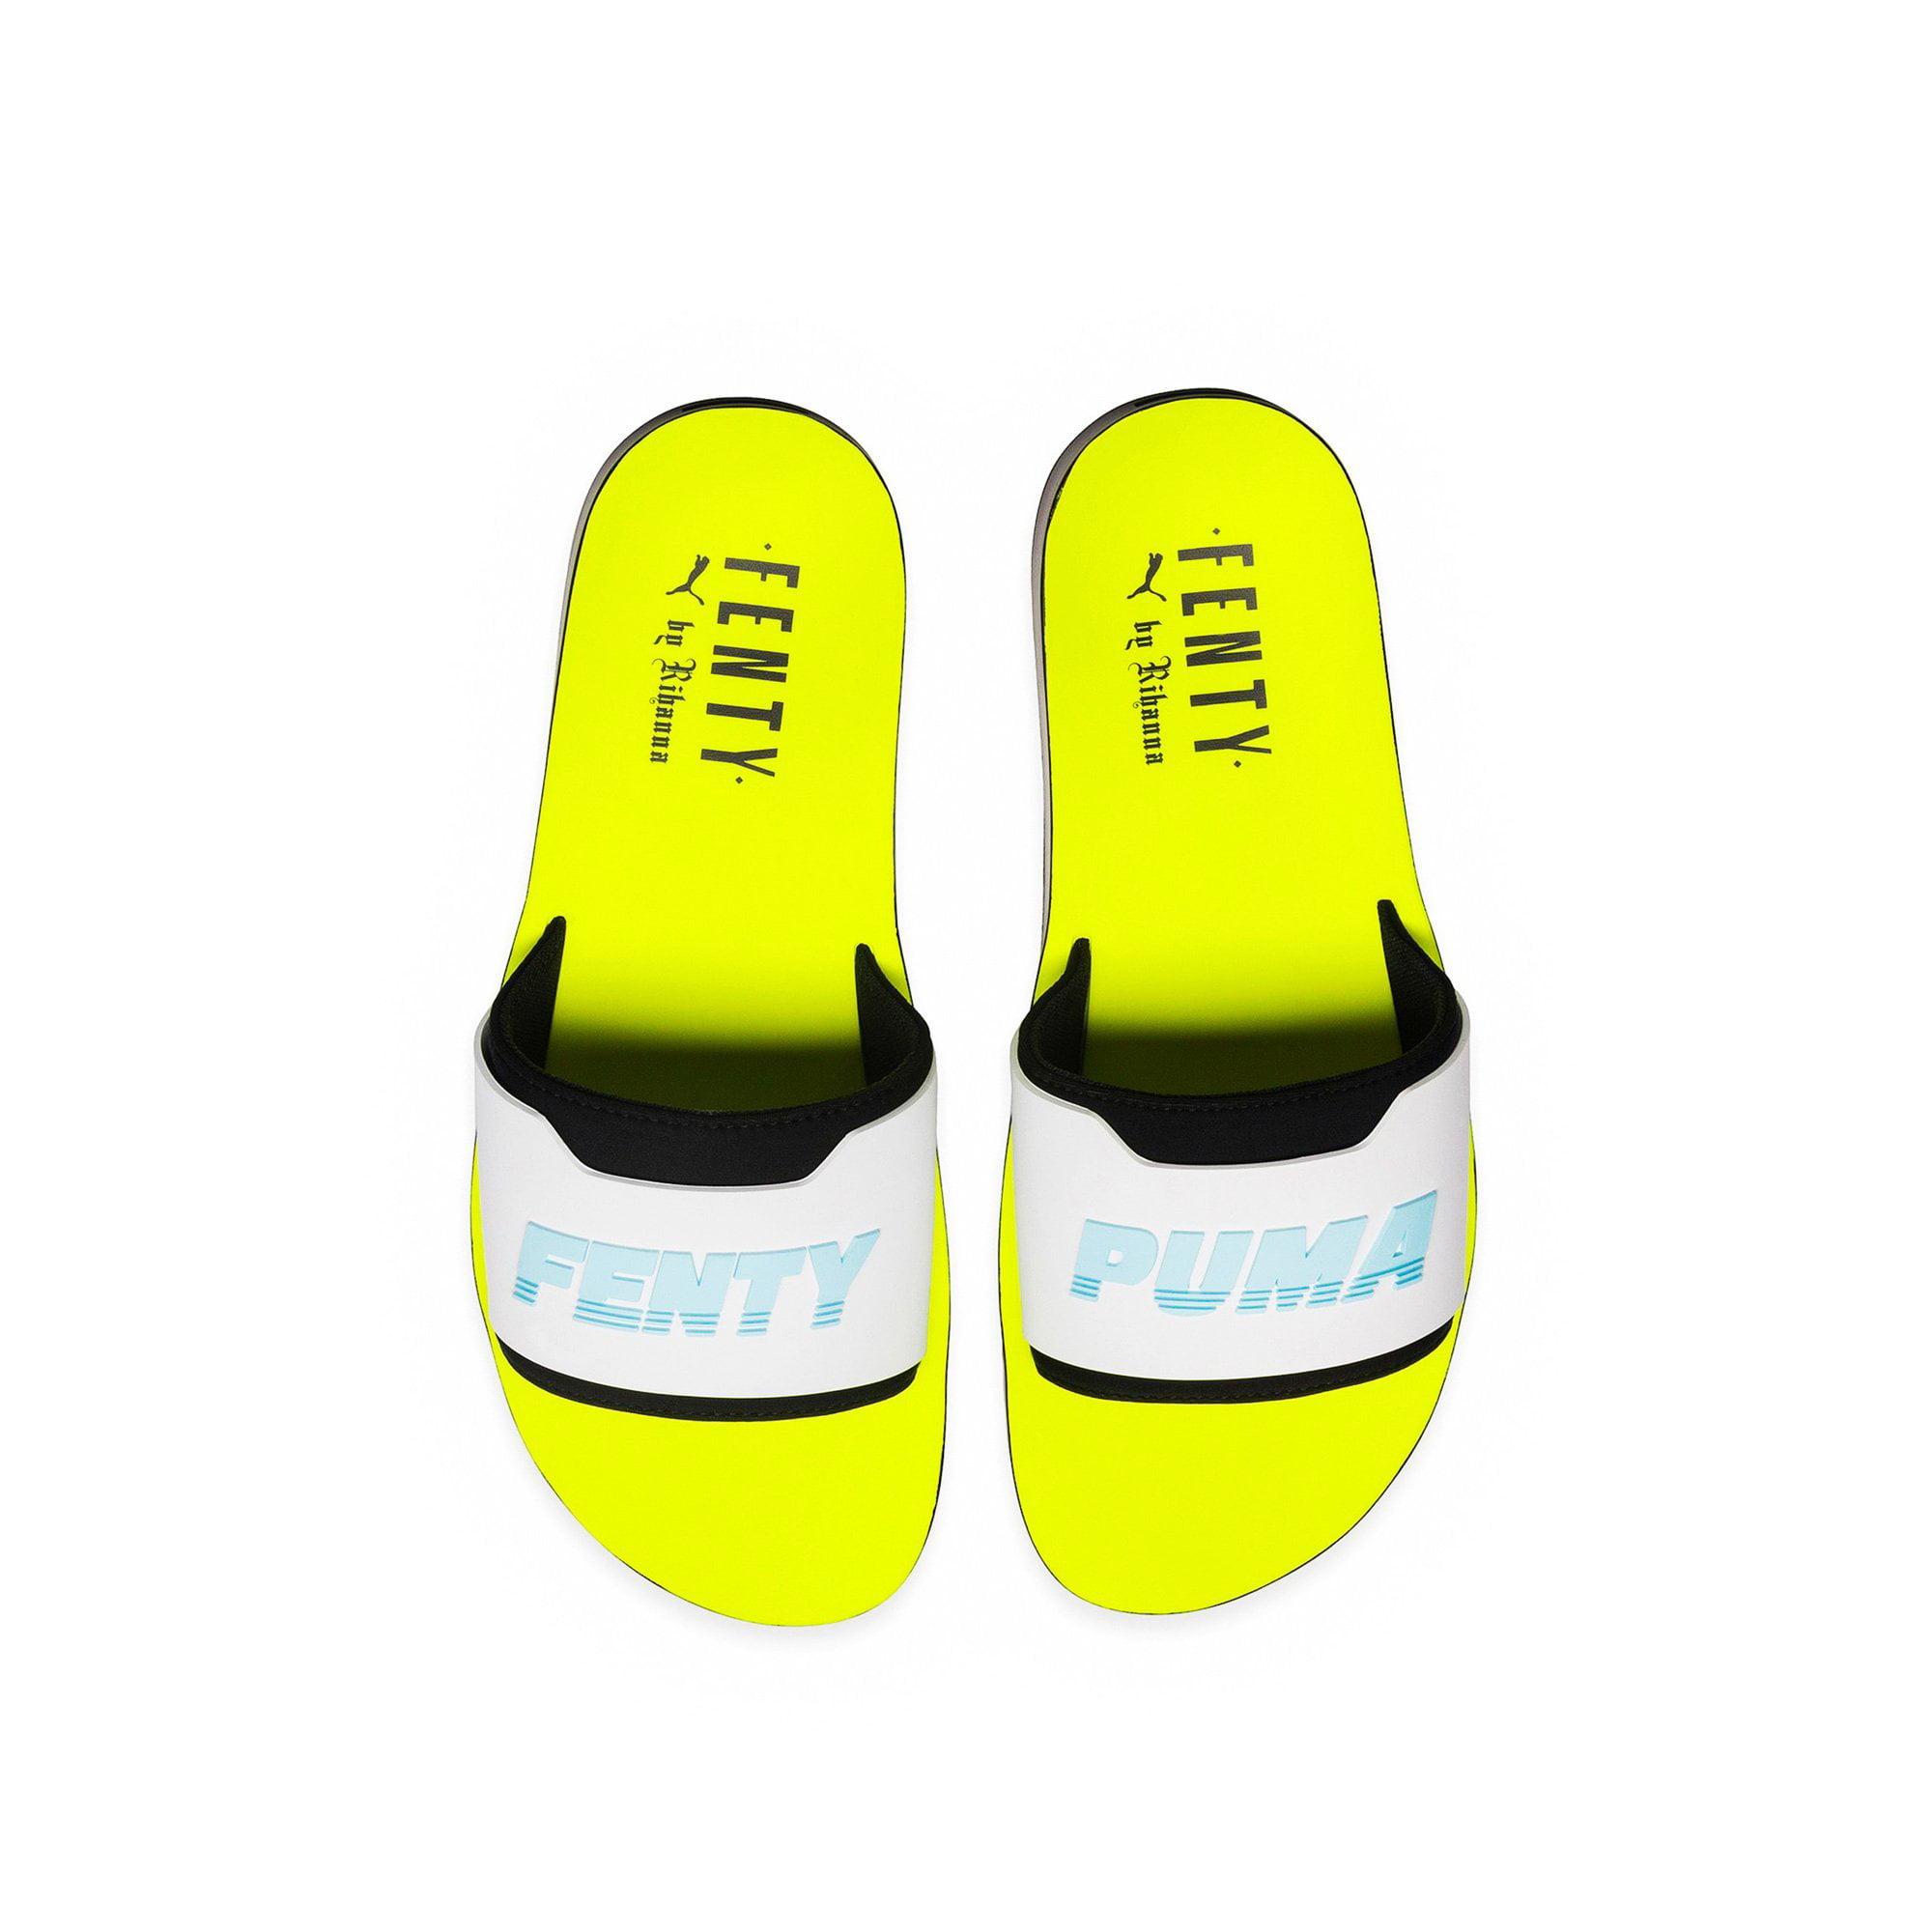 fenty puma slides yellow